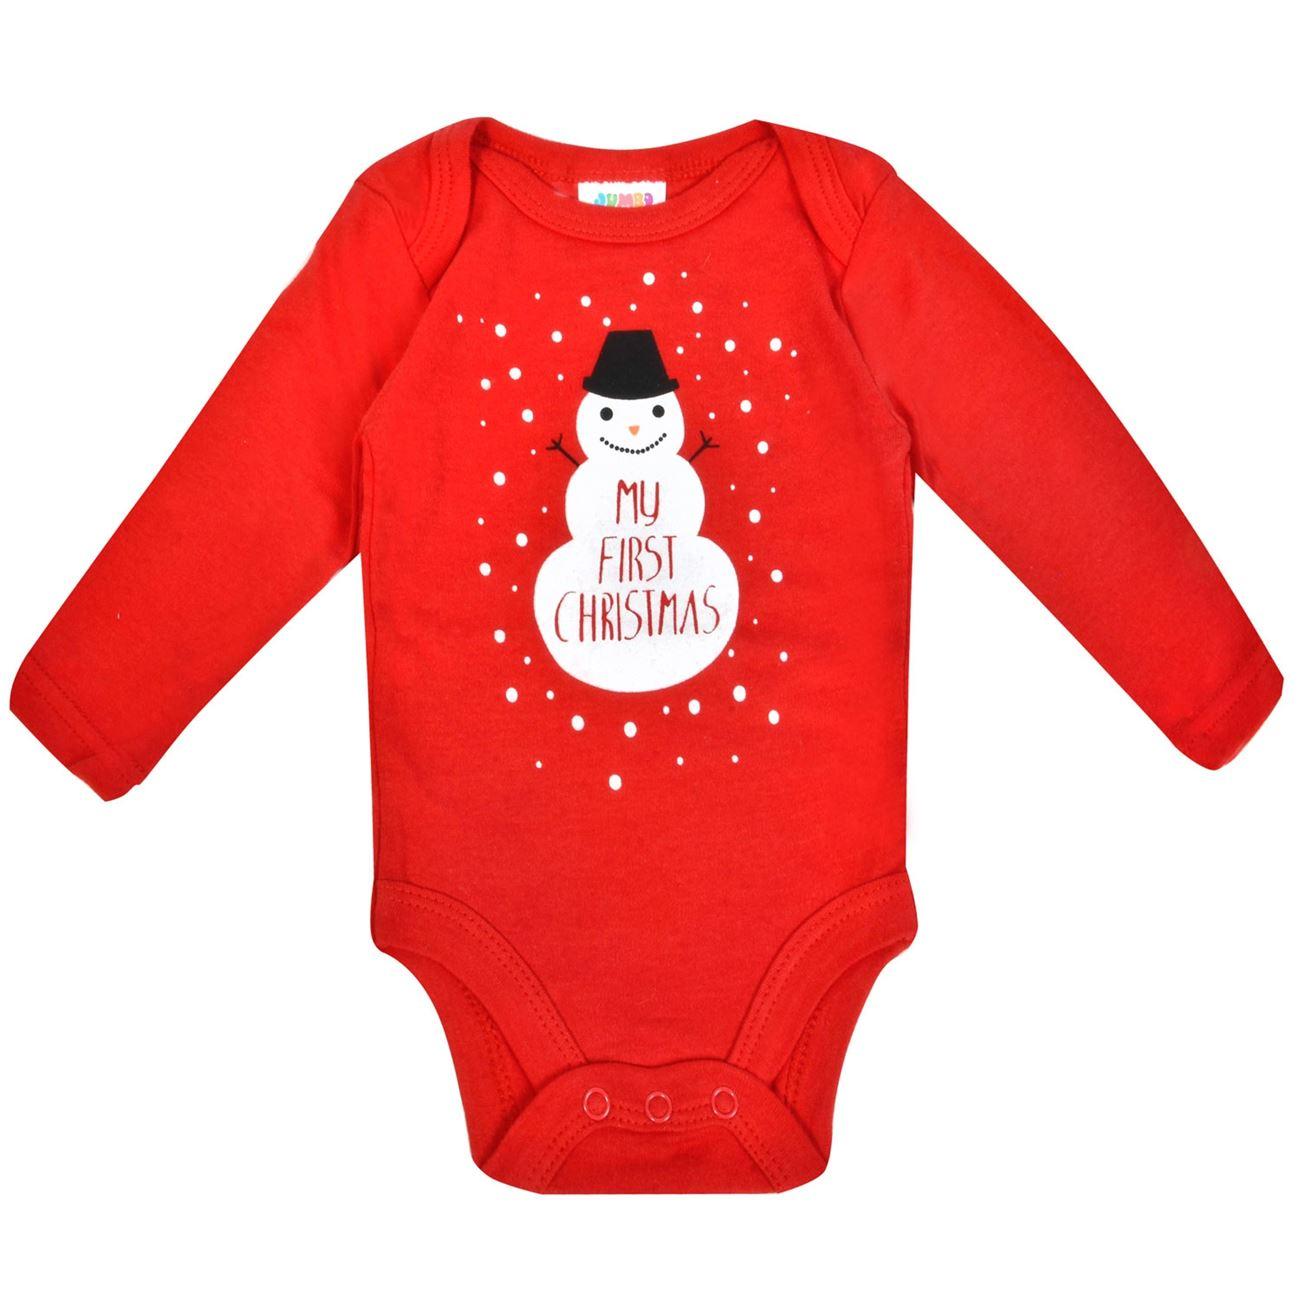 59755248a72 Βρεφικό Χριστουγεννιάτικο Εσώρουχο Φορμάκι Κόκκινο Χιονάνθρωπος < Εσώρουχα- Φορμάκια Bebe Χριστουγεννιάτικα   Jumbo